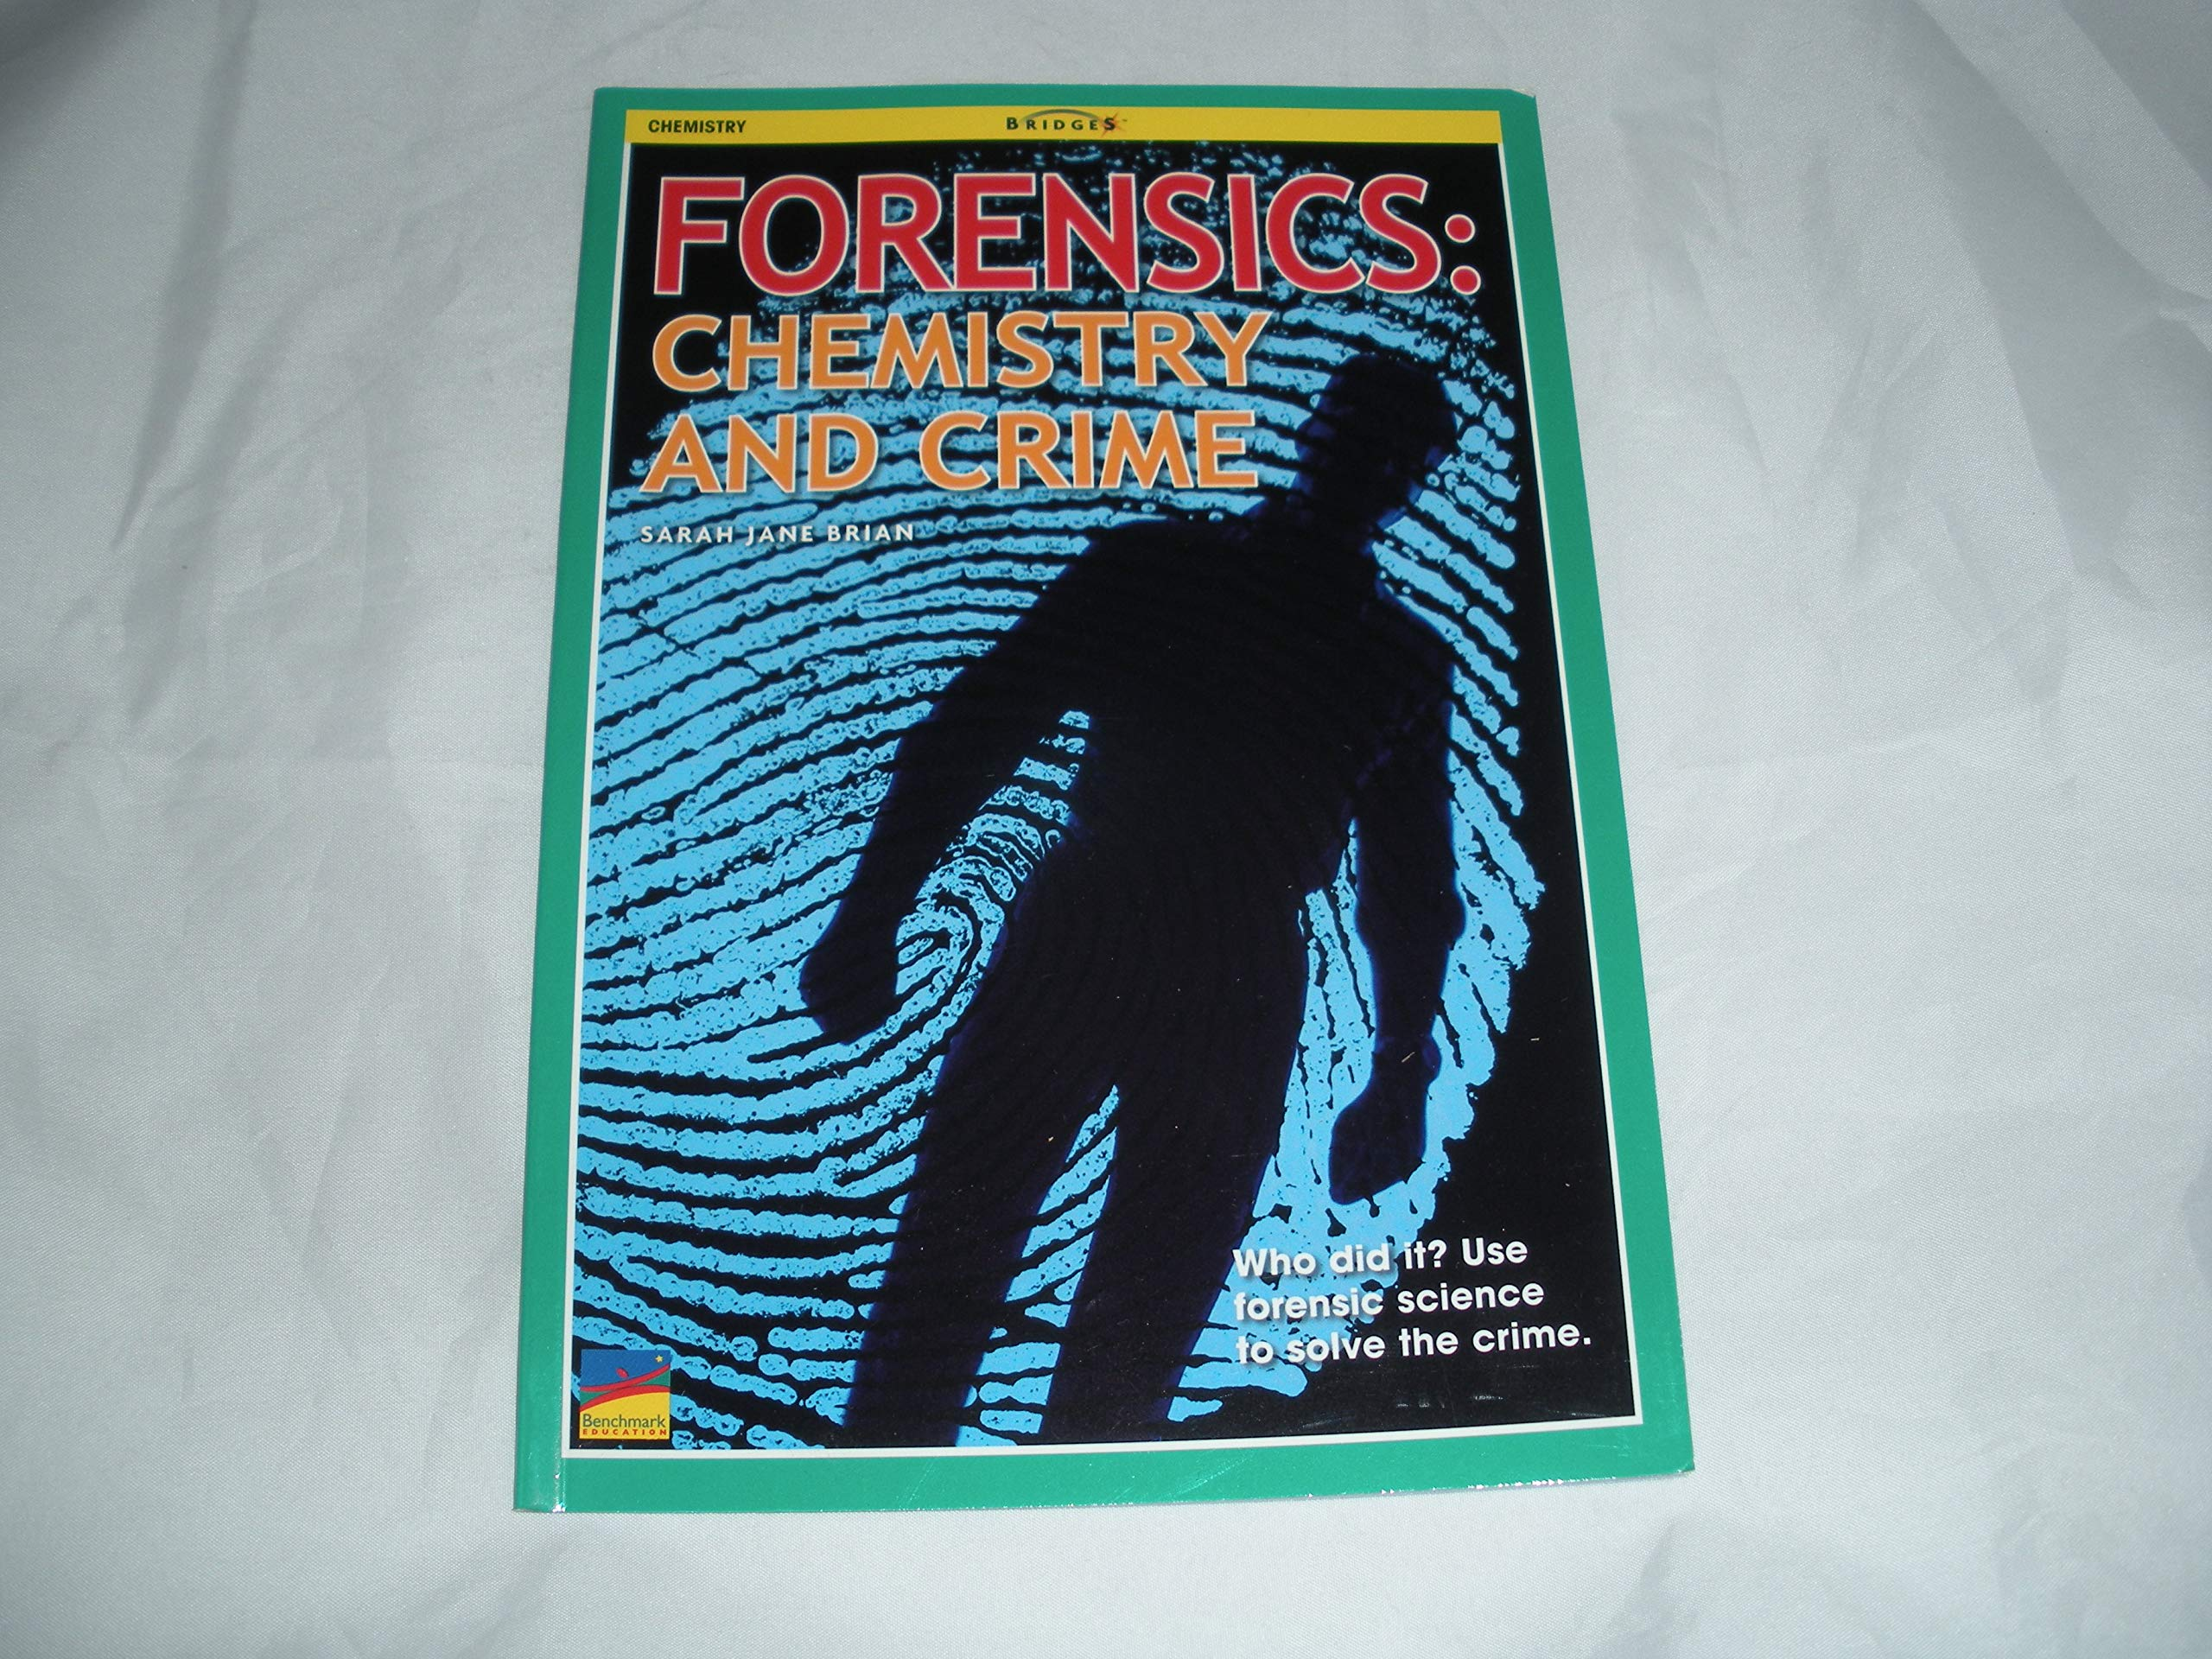 Forensics Chemistry And Crime Bridges Sarah Jane Brian Author 9781450928533 Amazon Com Books